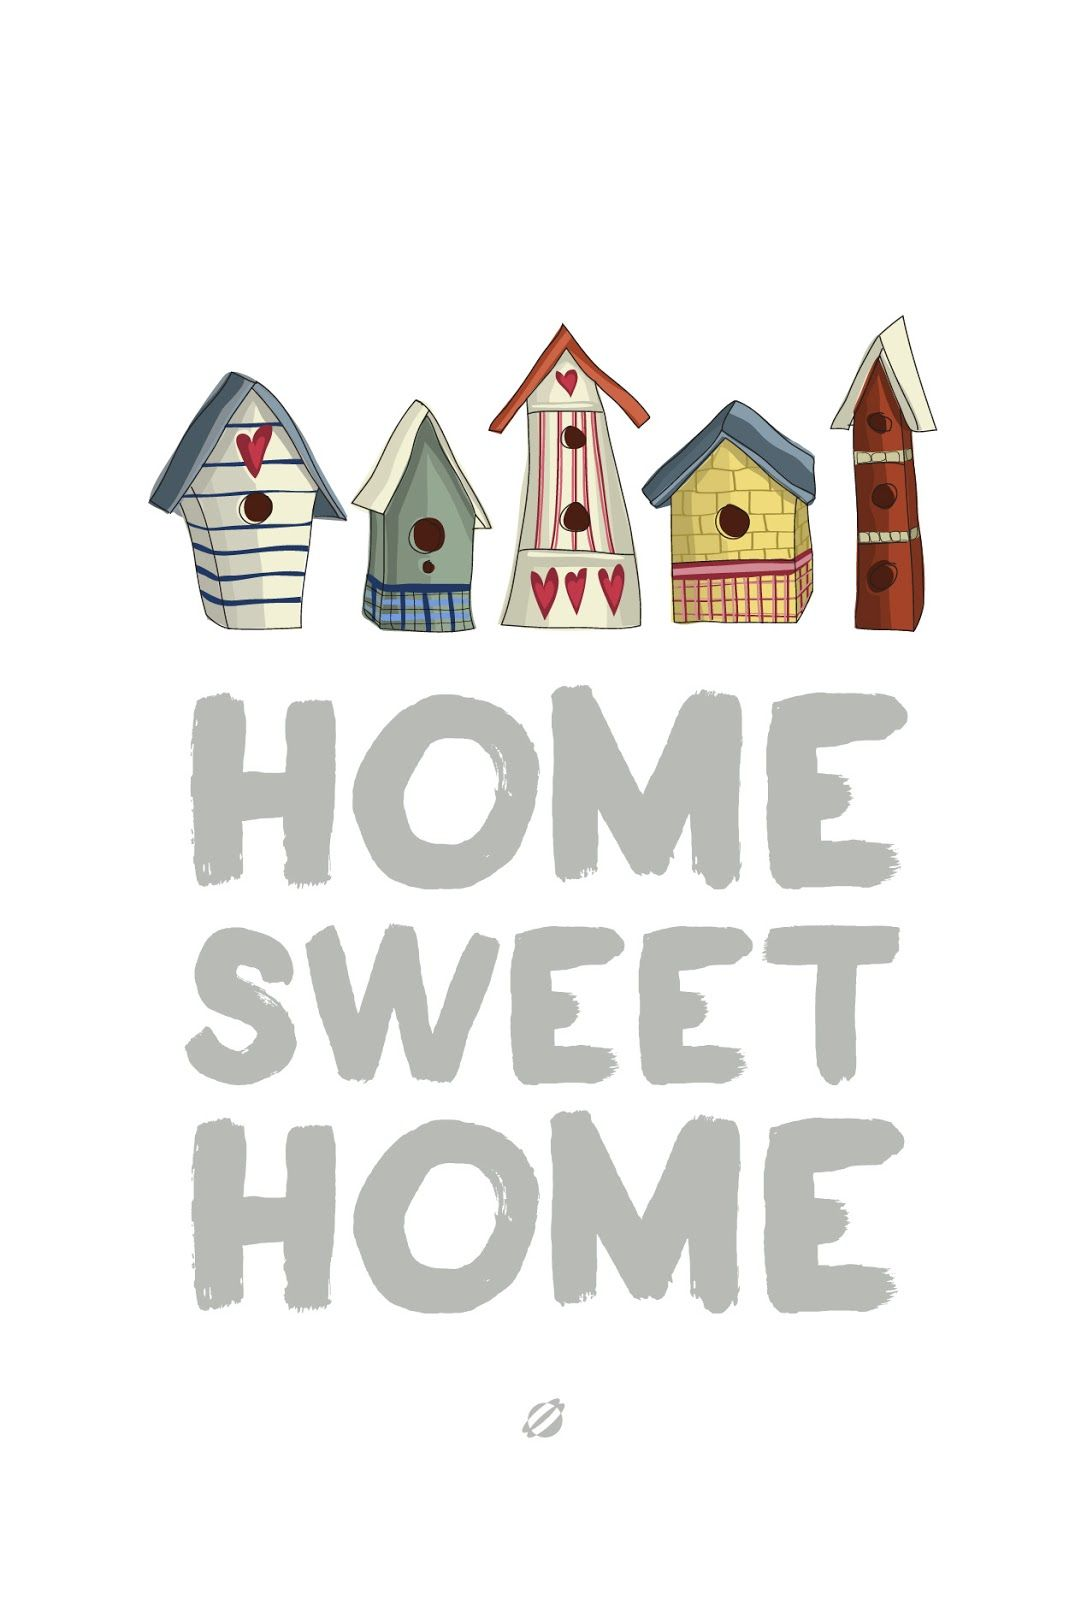 image regarding Home Sweet Home Printable identified as Cost-free estimate printable: household lovable household / LostBumblebee Property